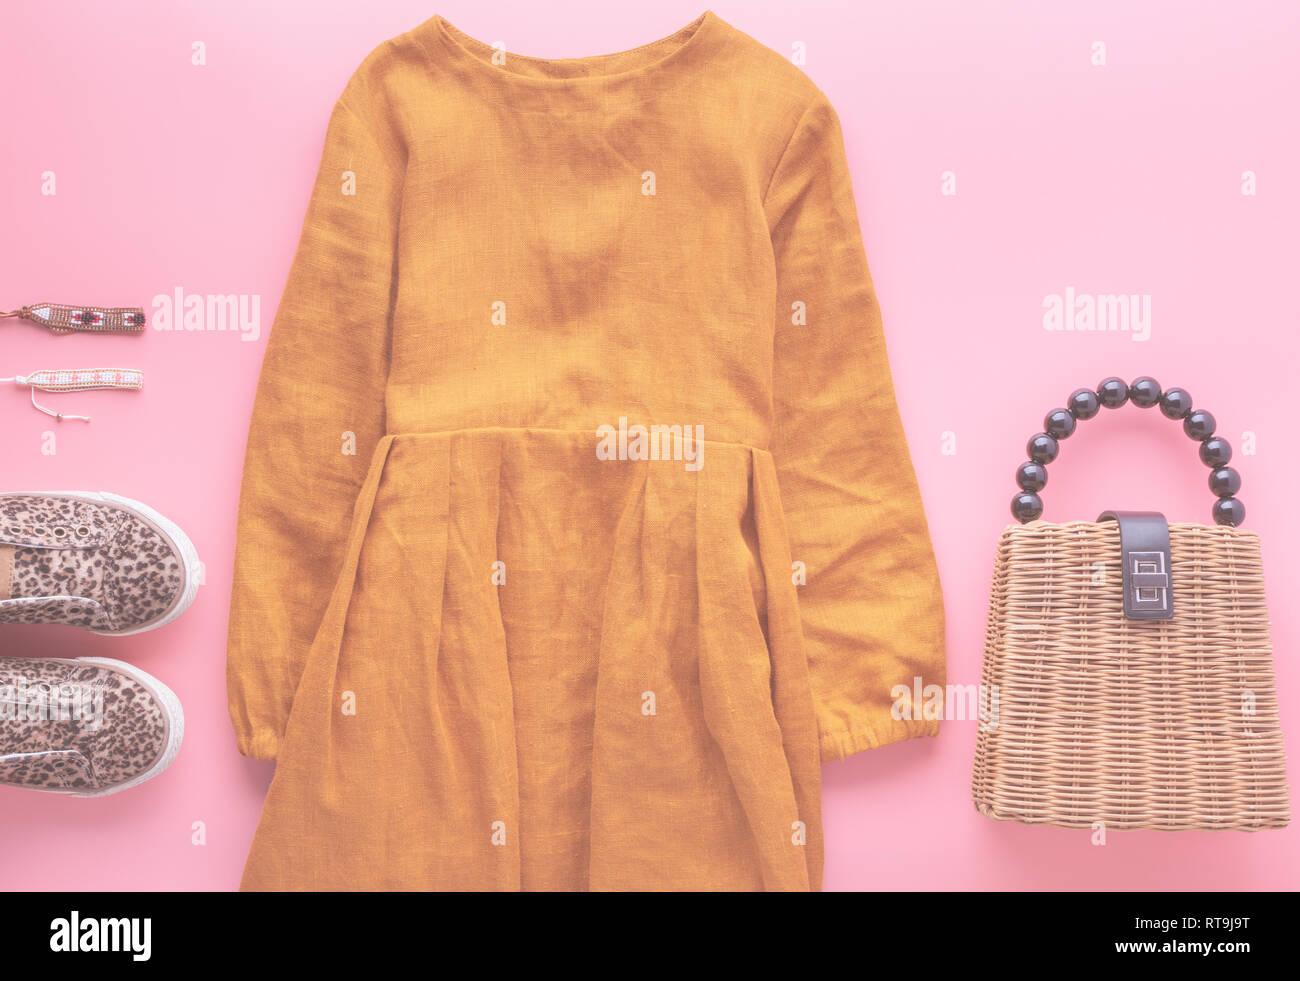 52bcf84019d4 Girls fashion background, mustard color linen dress, trendy straw bag,  leopard print shoes